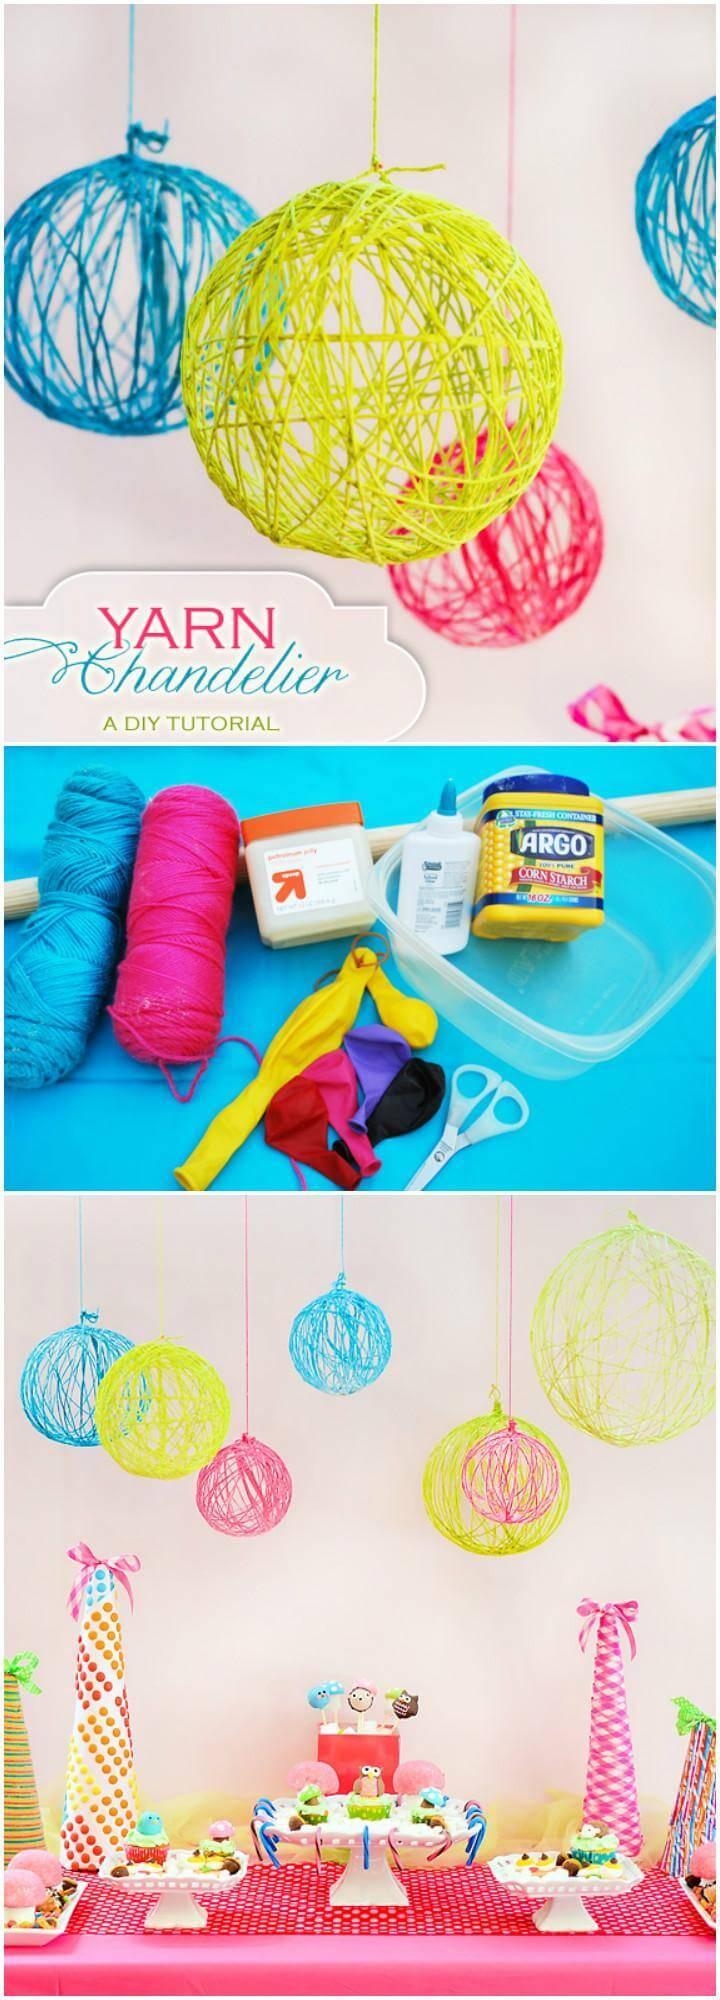 DIY Homemade Yarn Chandelier